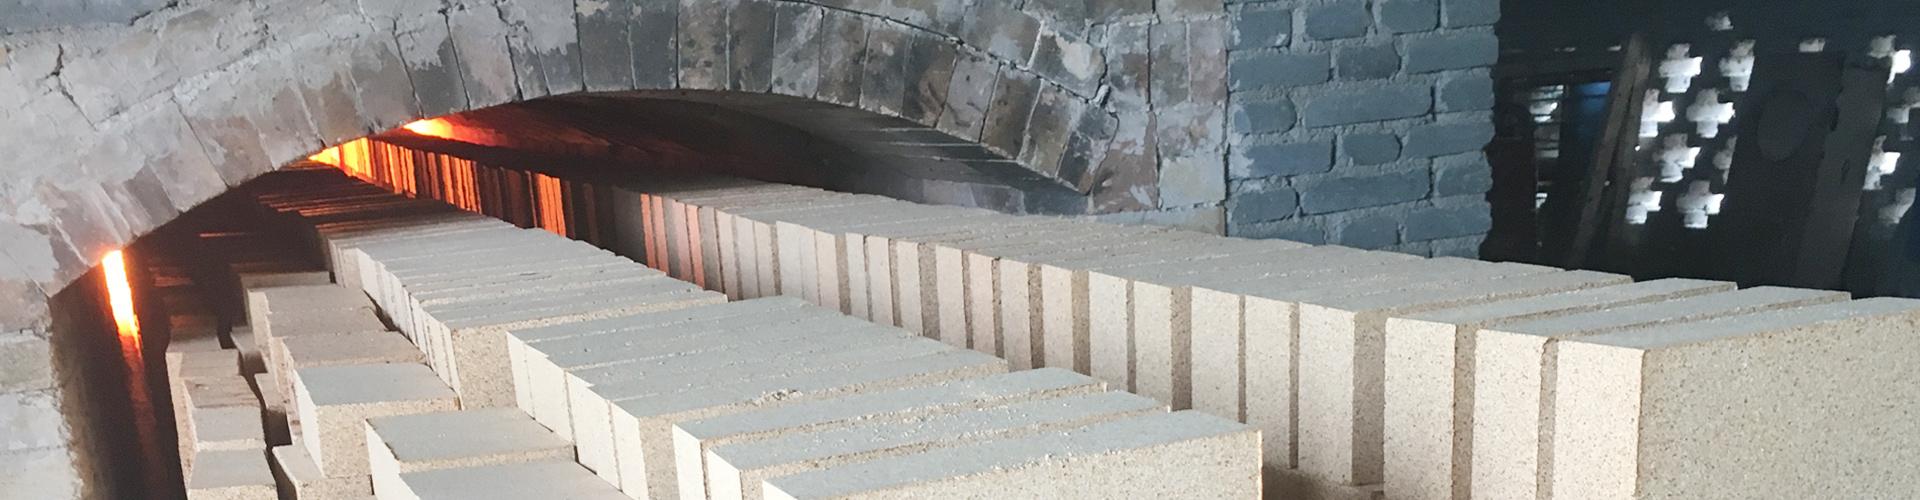 Fireplace Refractory Brick